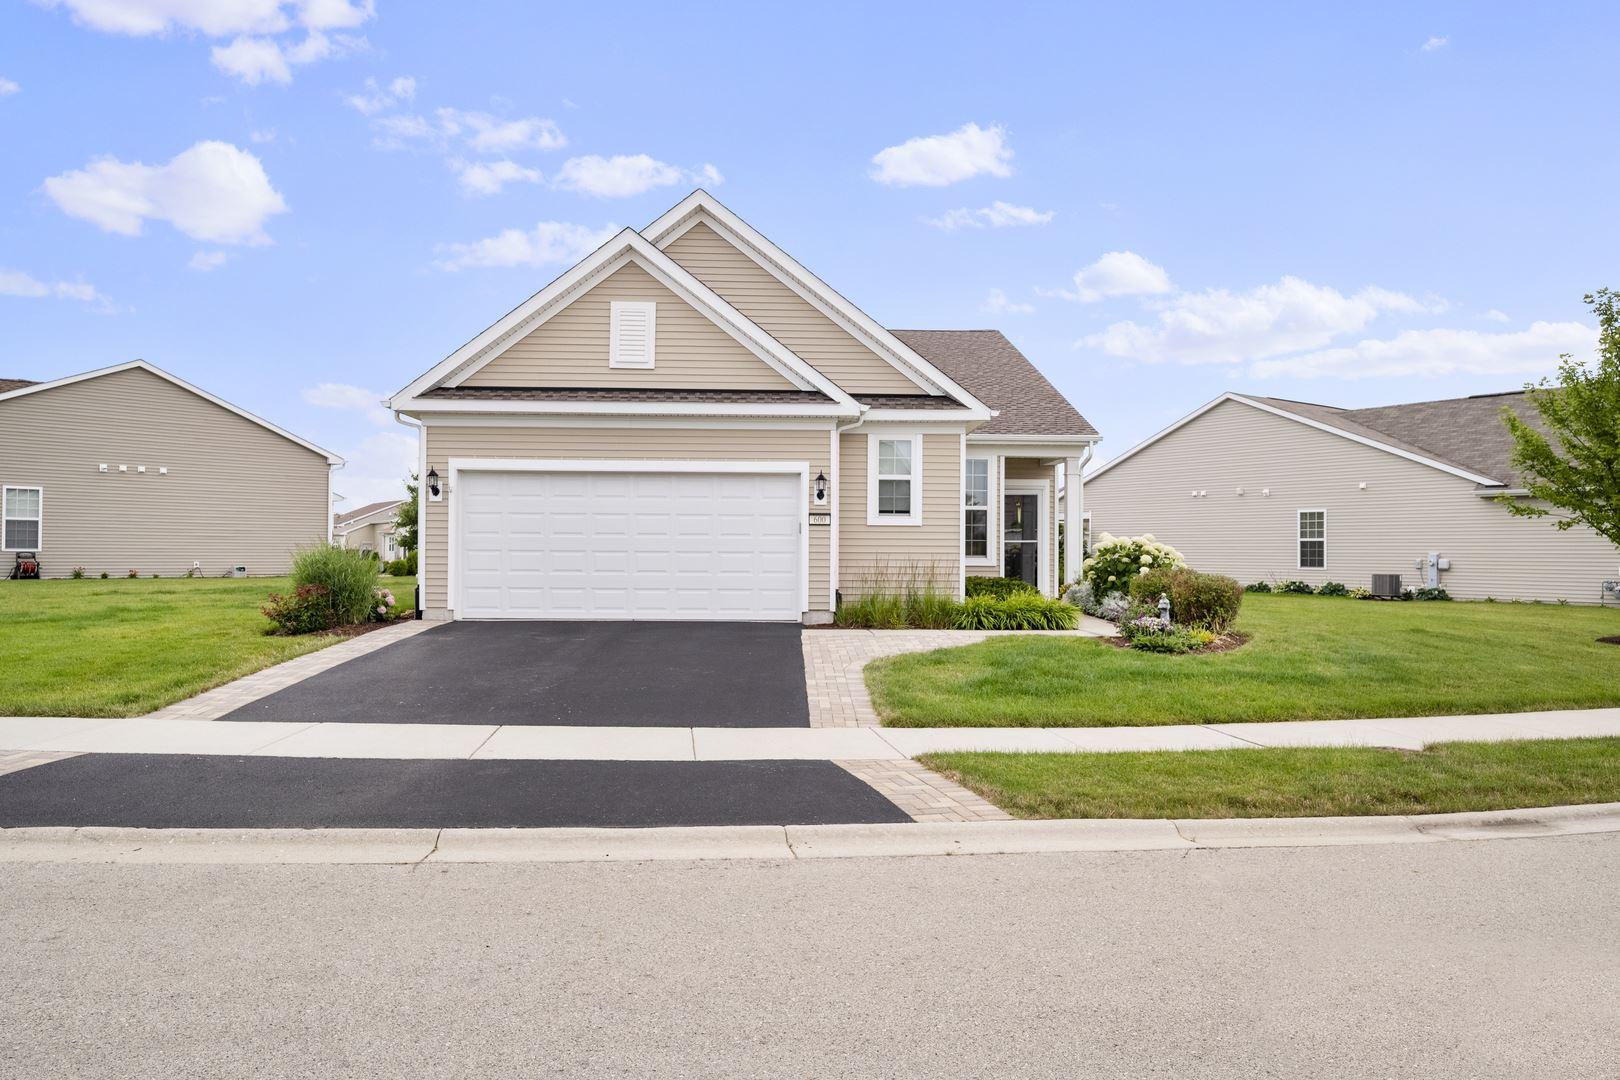 Photo of 600 Pleasant Drive, Shorewood, IL 60404 (MLS # 11151910)